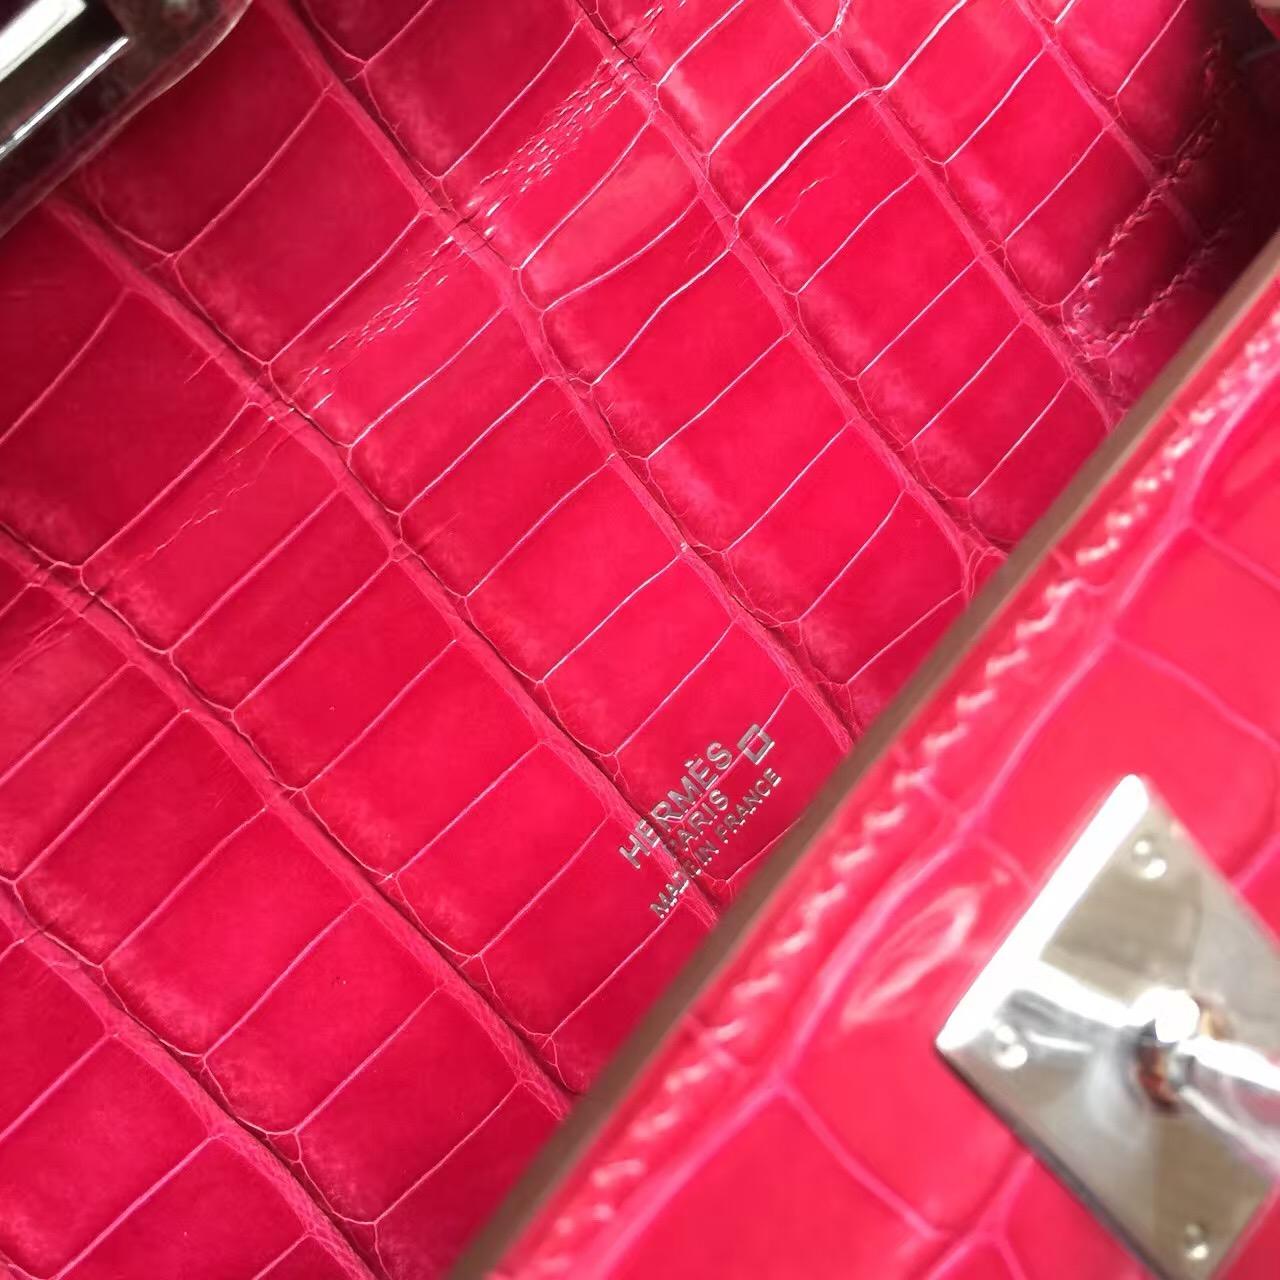 Hermes 5J Rose Scheherazade Crocodile Shiny Leather Mini Kelly Bag 22CM